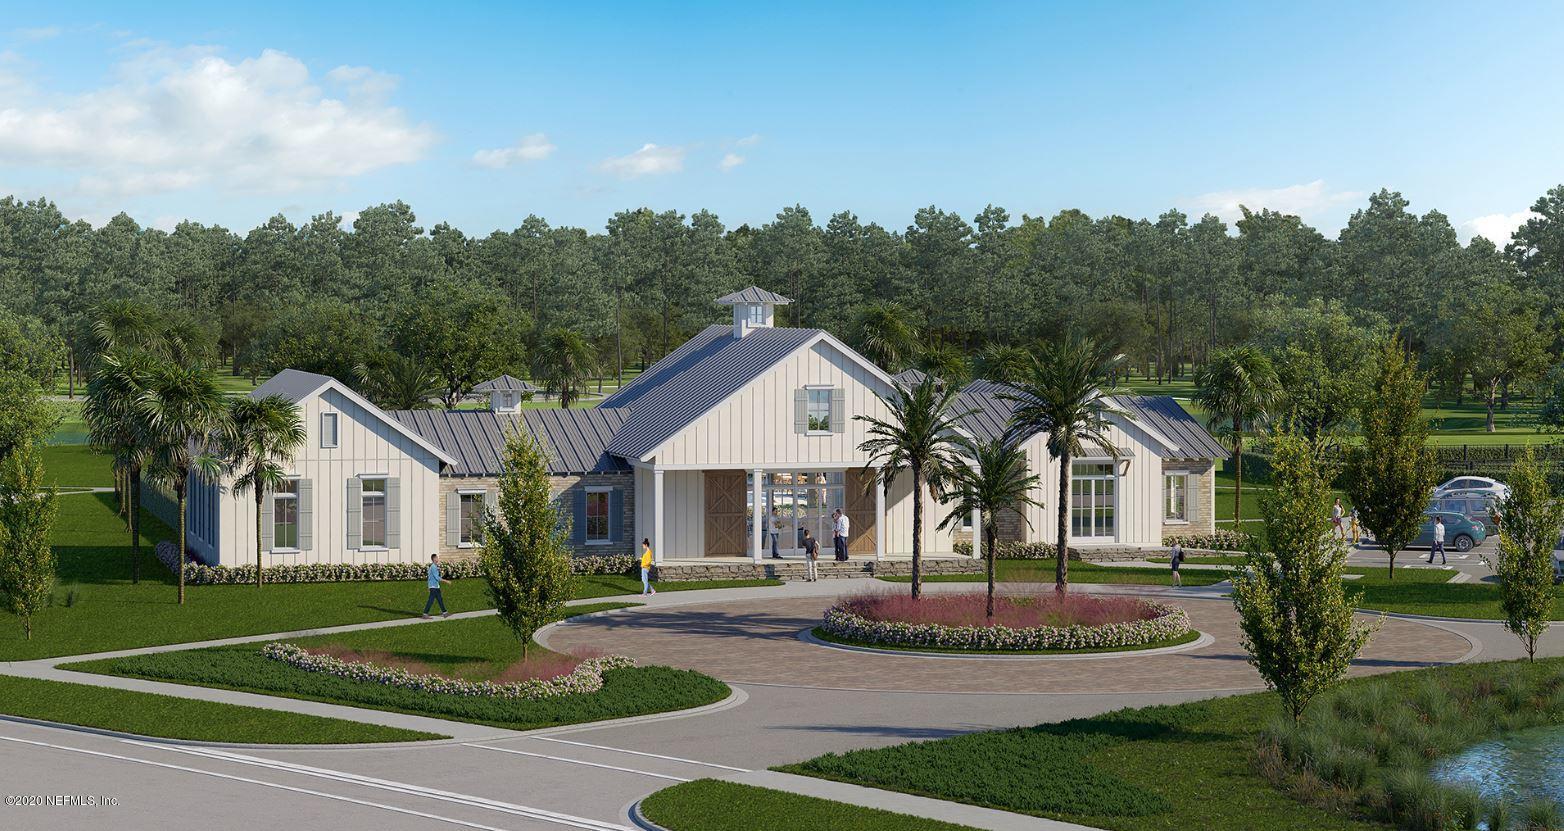 279 MORNING MIST, ST JOHNS, FLORIDA 32259, 4 Bedrooms Bedrooms, ,3 BathroomsBathrooms,Residential,For sale,MORNING MIST,1043042